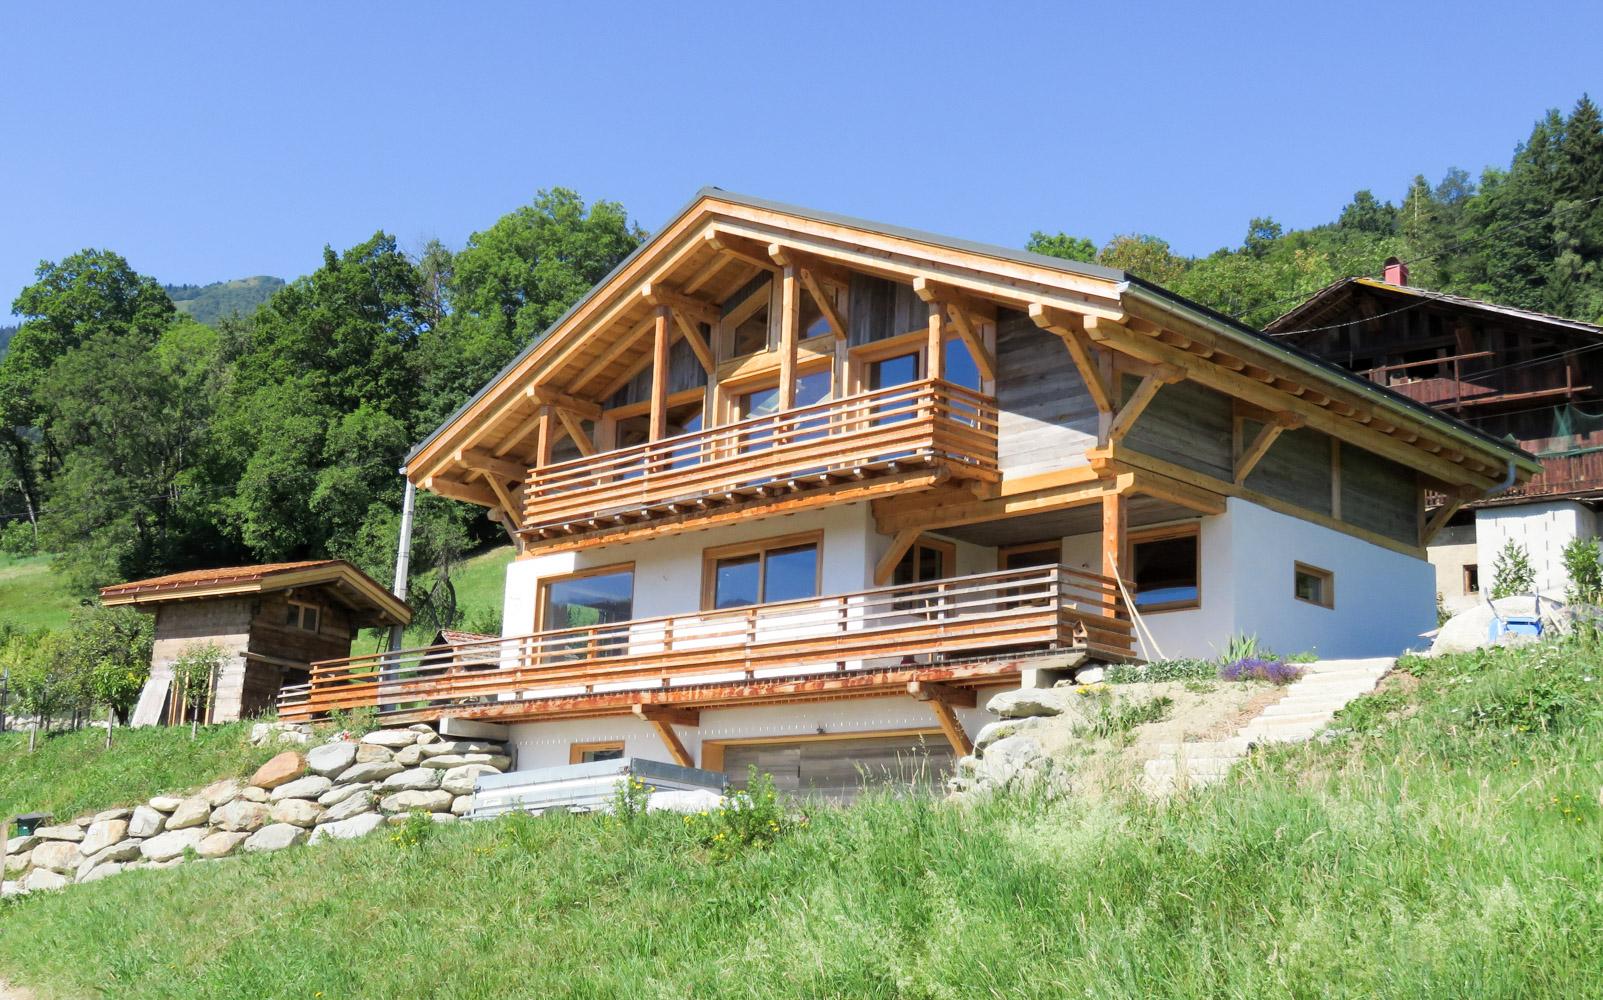 charpente bottollier cordon haute savoie 74 charpente bois. Black Bedroom Furniture Sets. Home Design Ideas